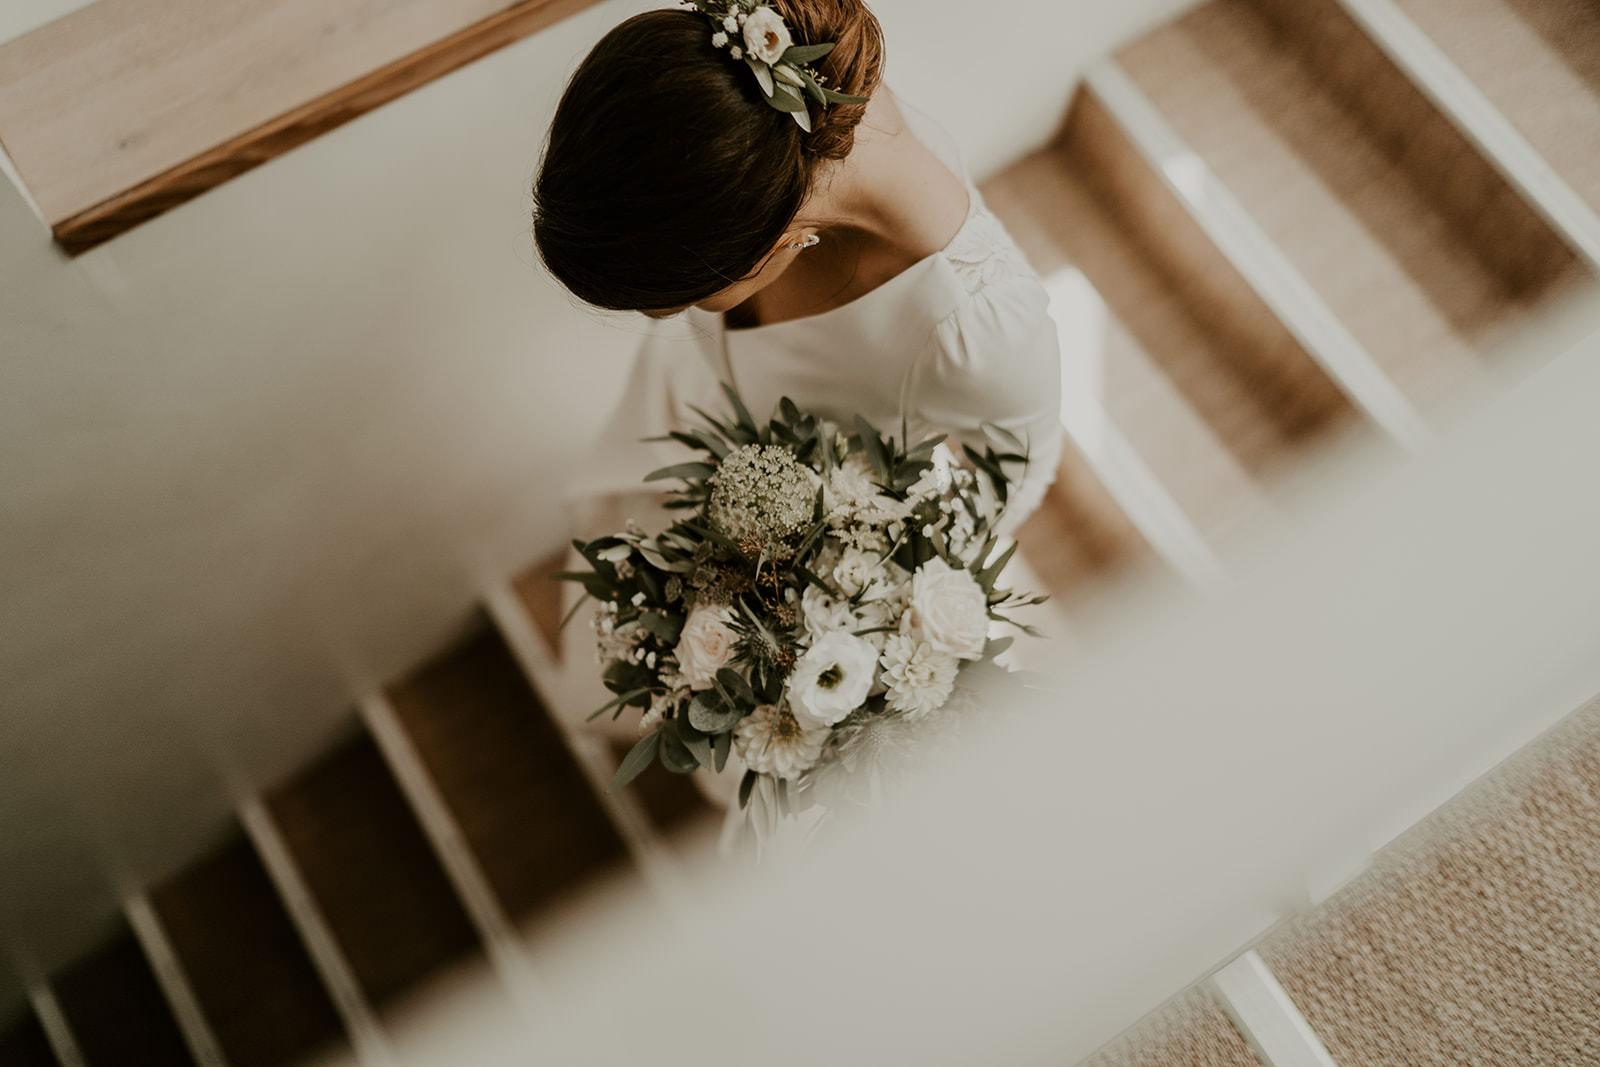 robe de mariee bouquet de mariage rennes